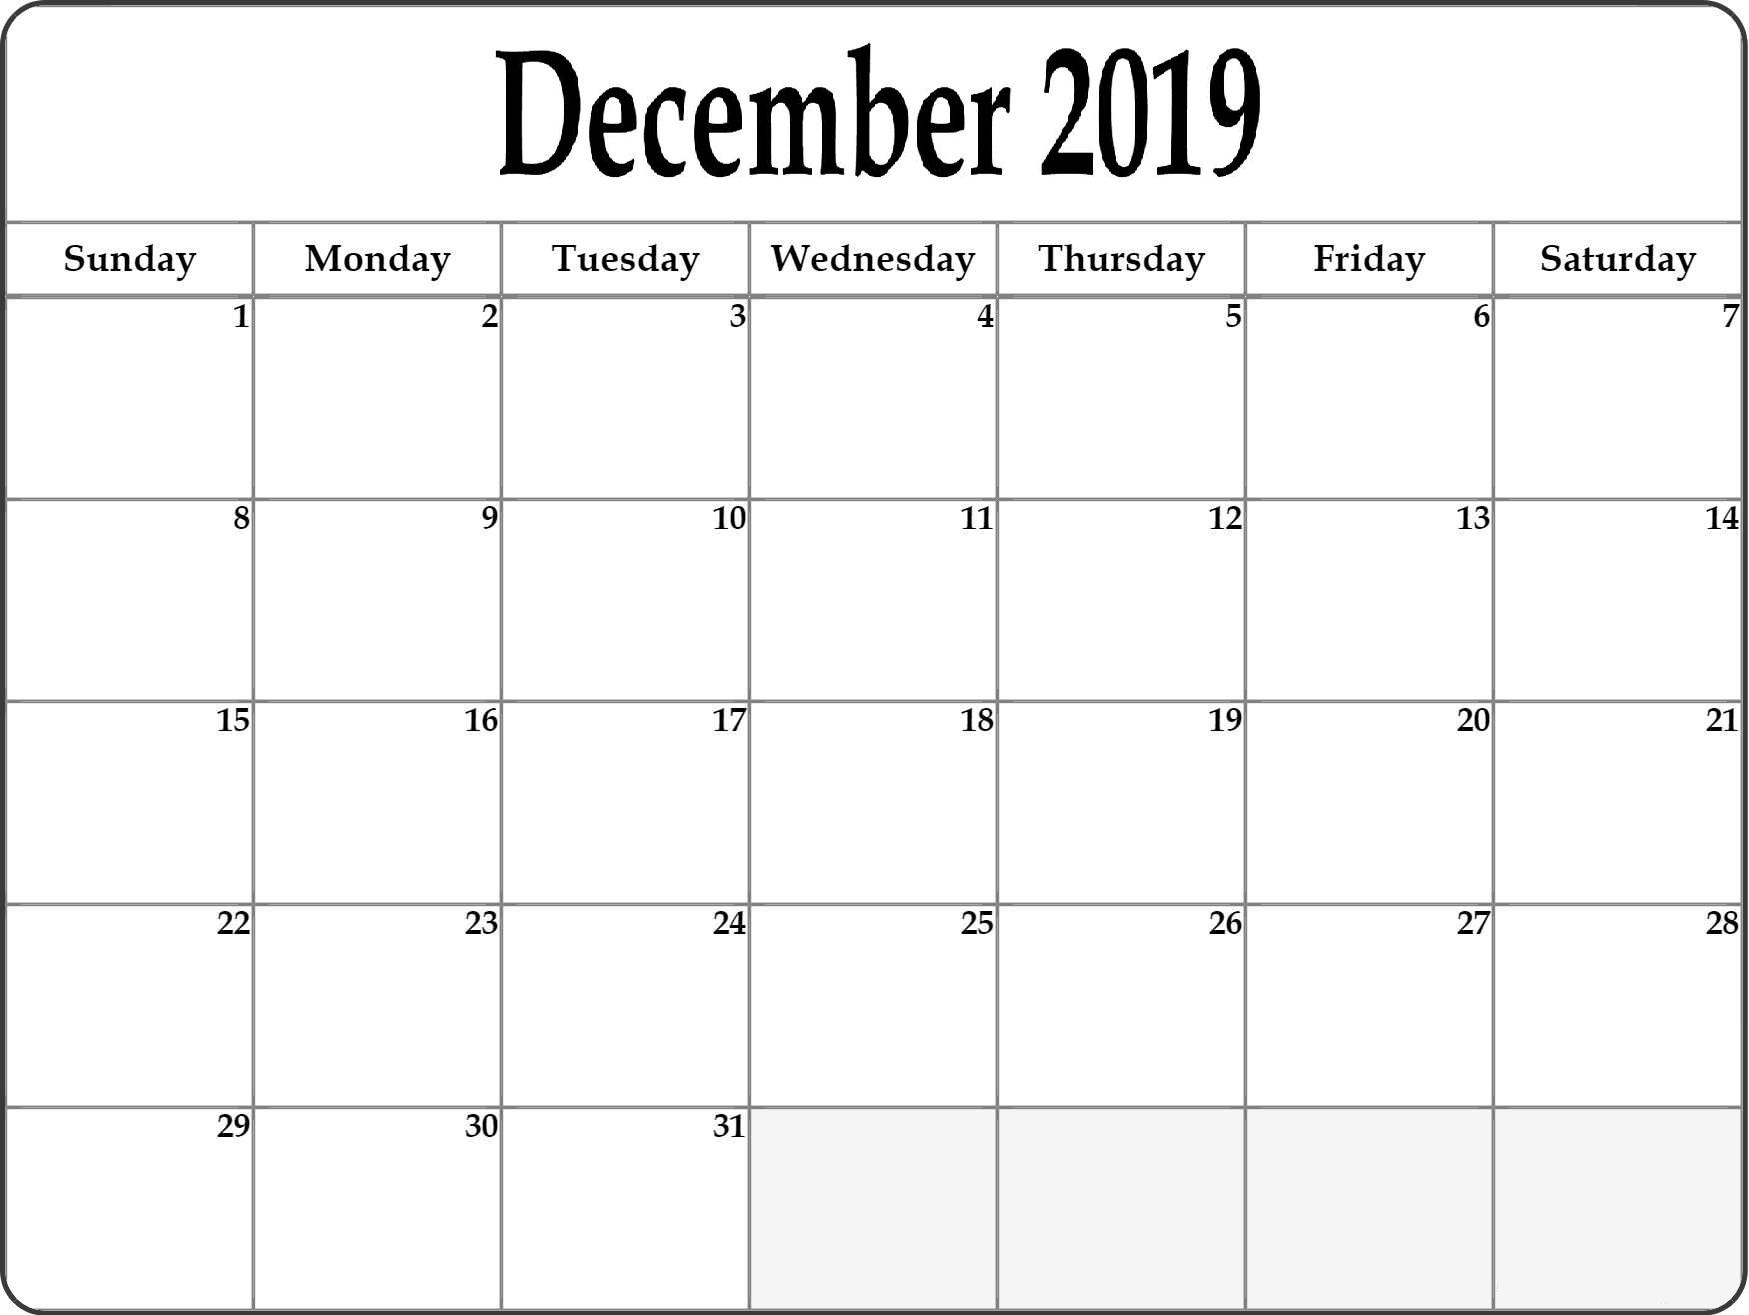 December 2019 Blank Calendar Page